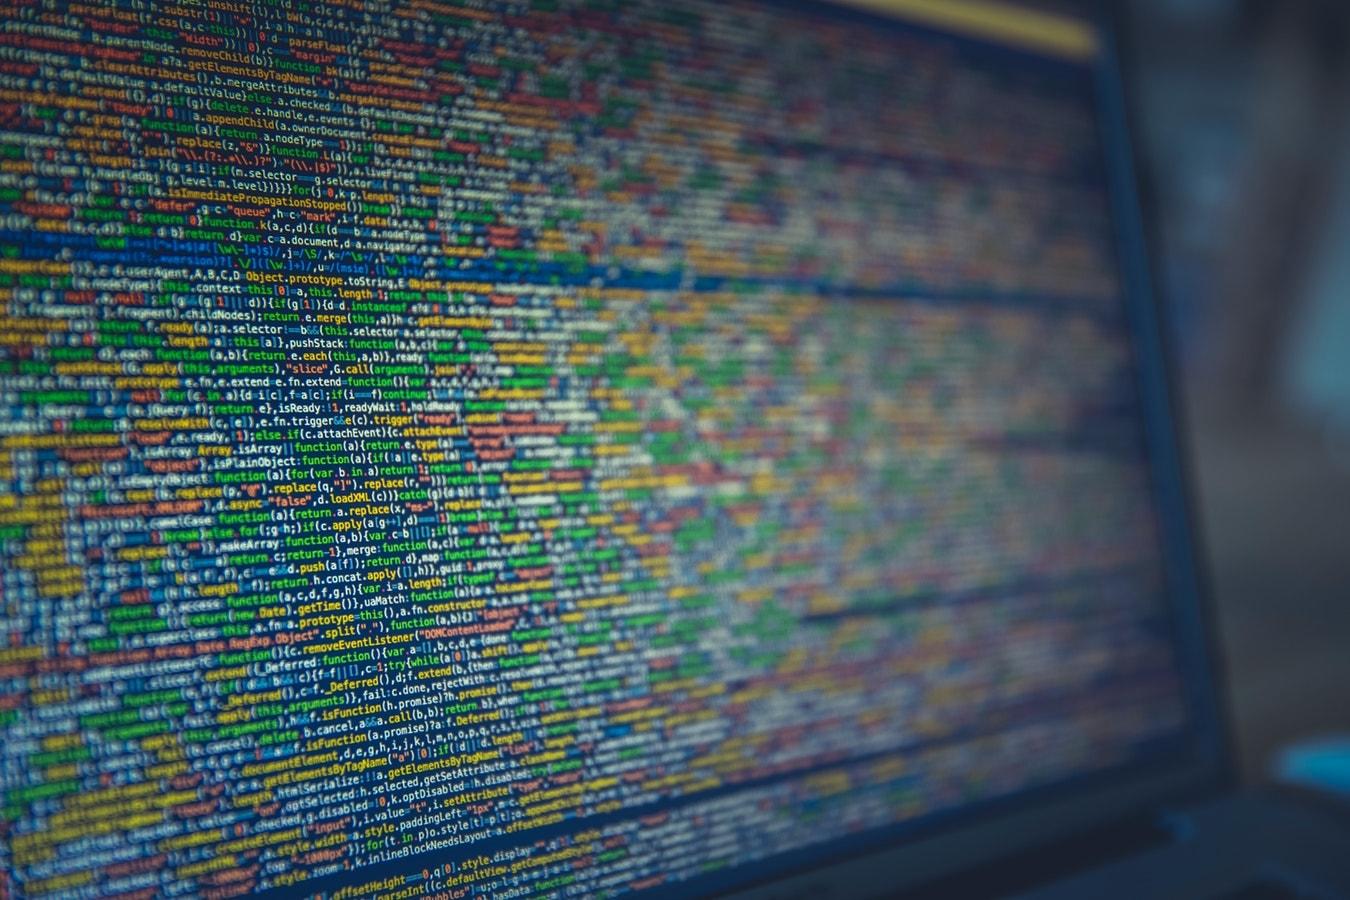 5-advanced-functionality-tips-for-Joomla-web-developmen_20180920-154358_1.jpg